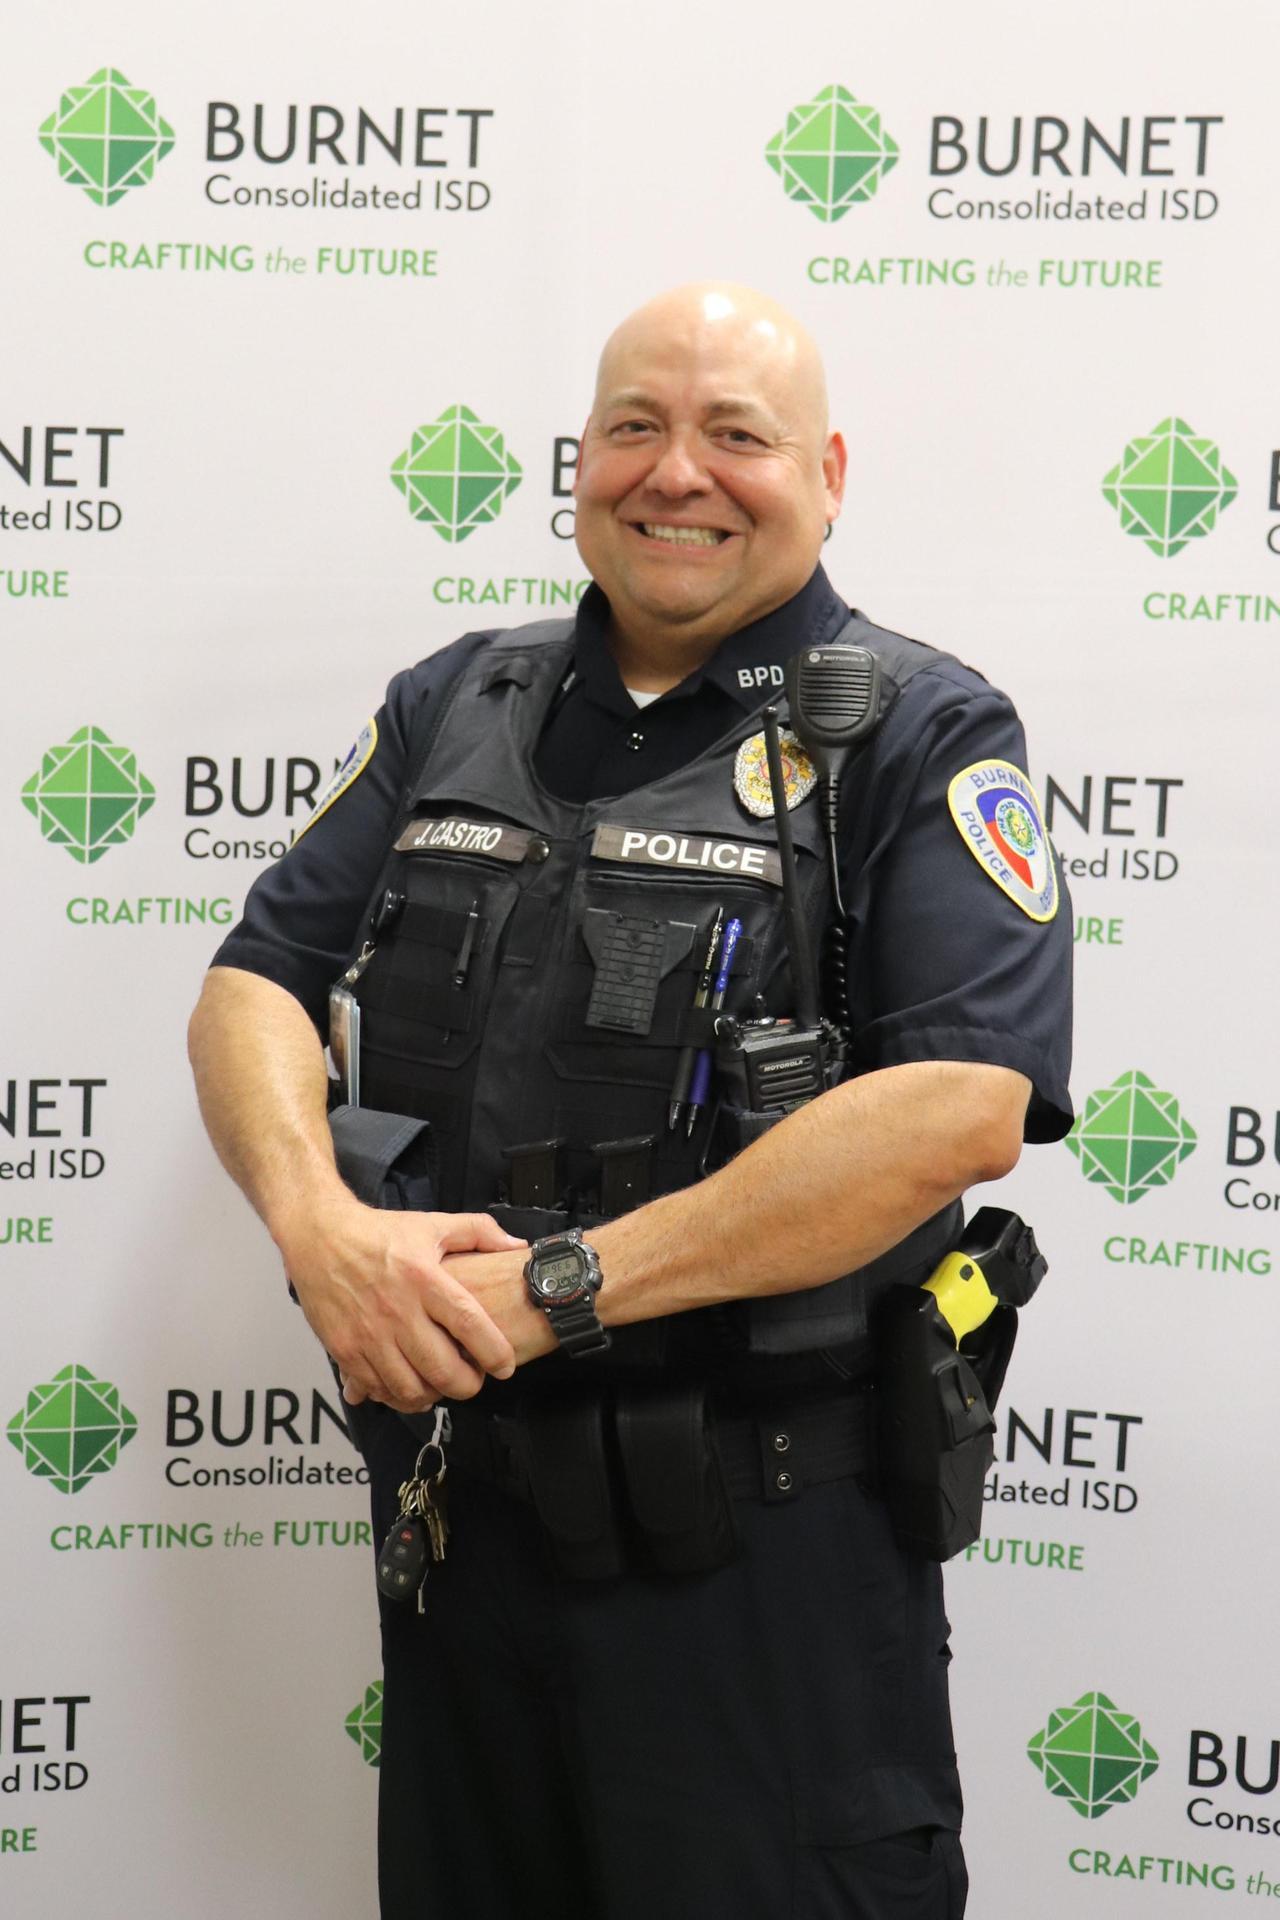 Officer Portrait